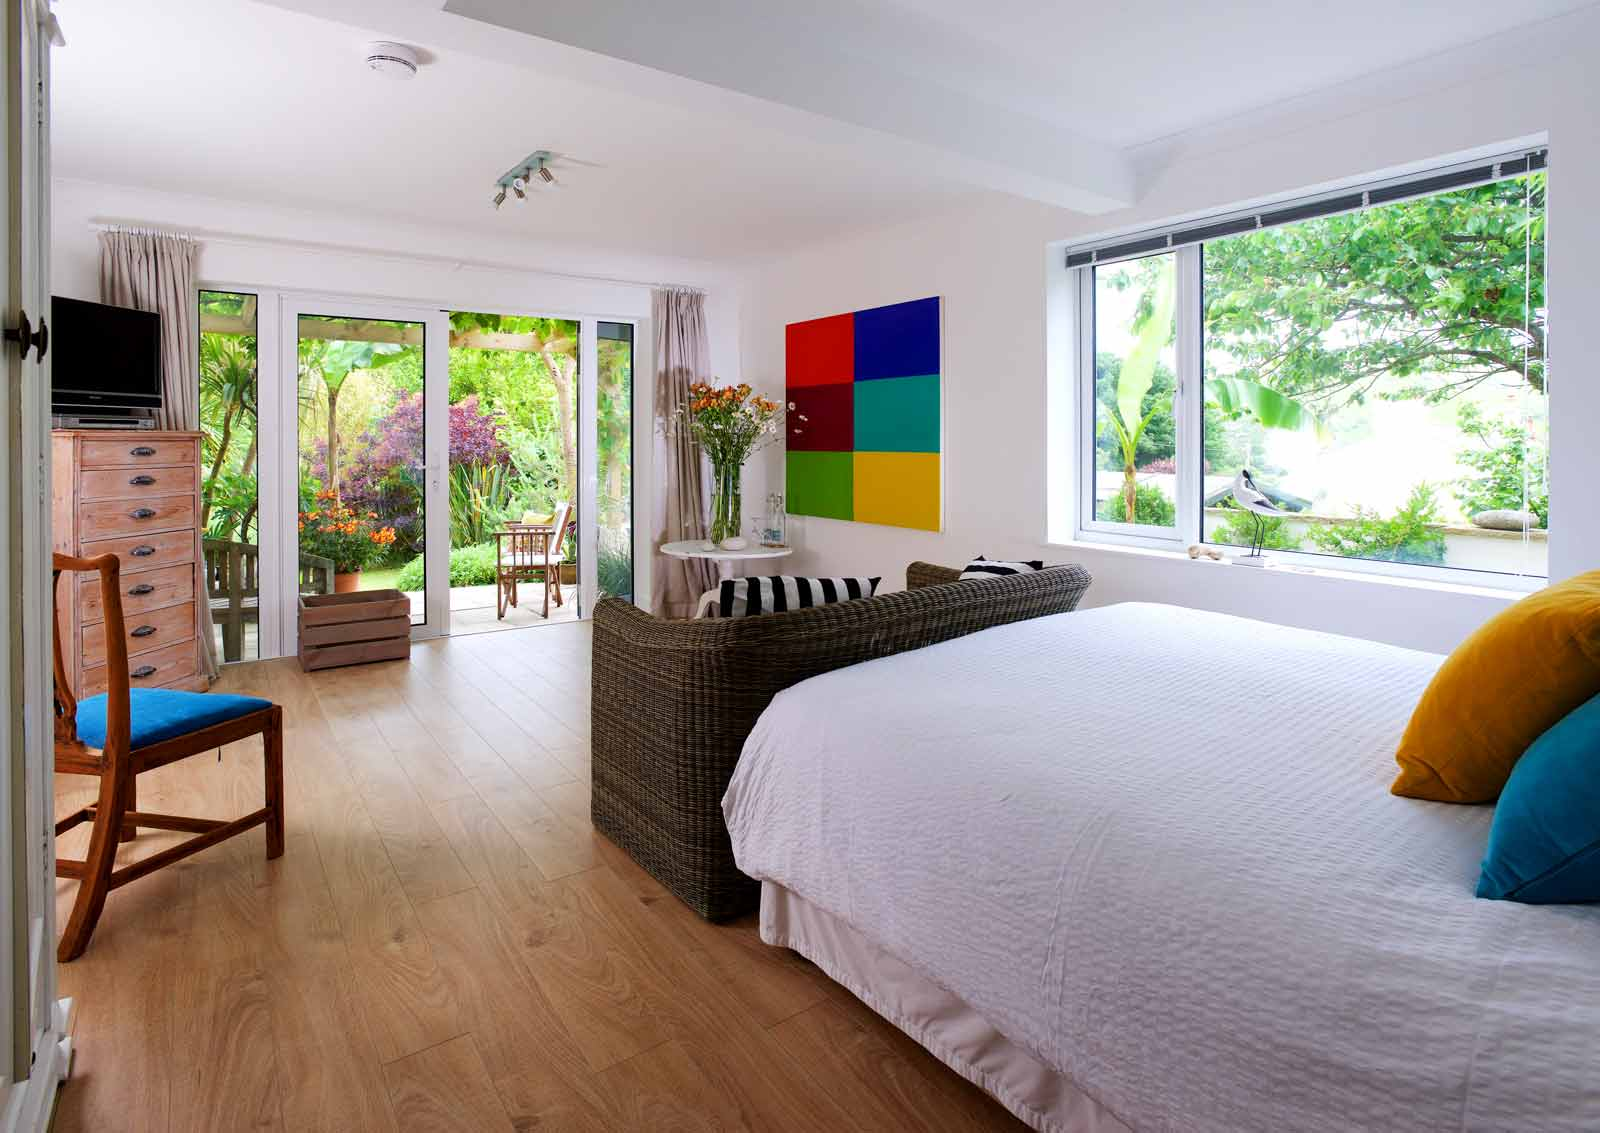 Lulworth House B&B Garden Suite